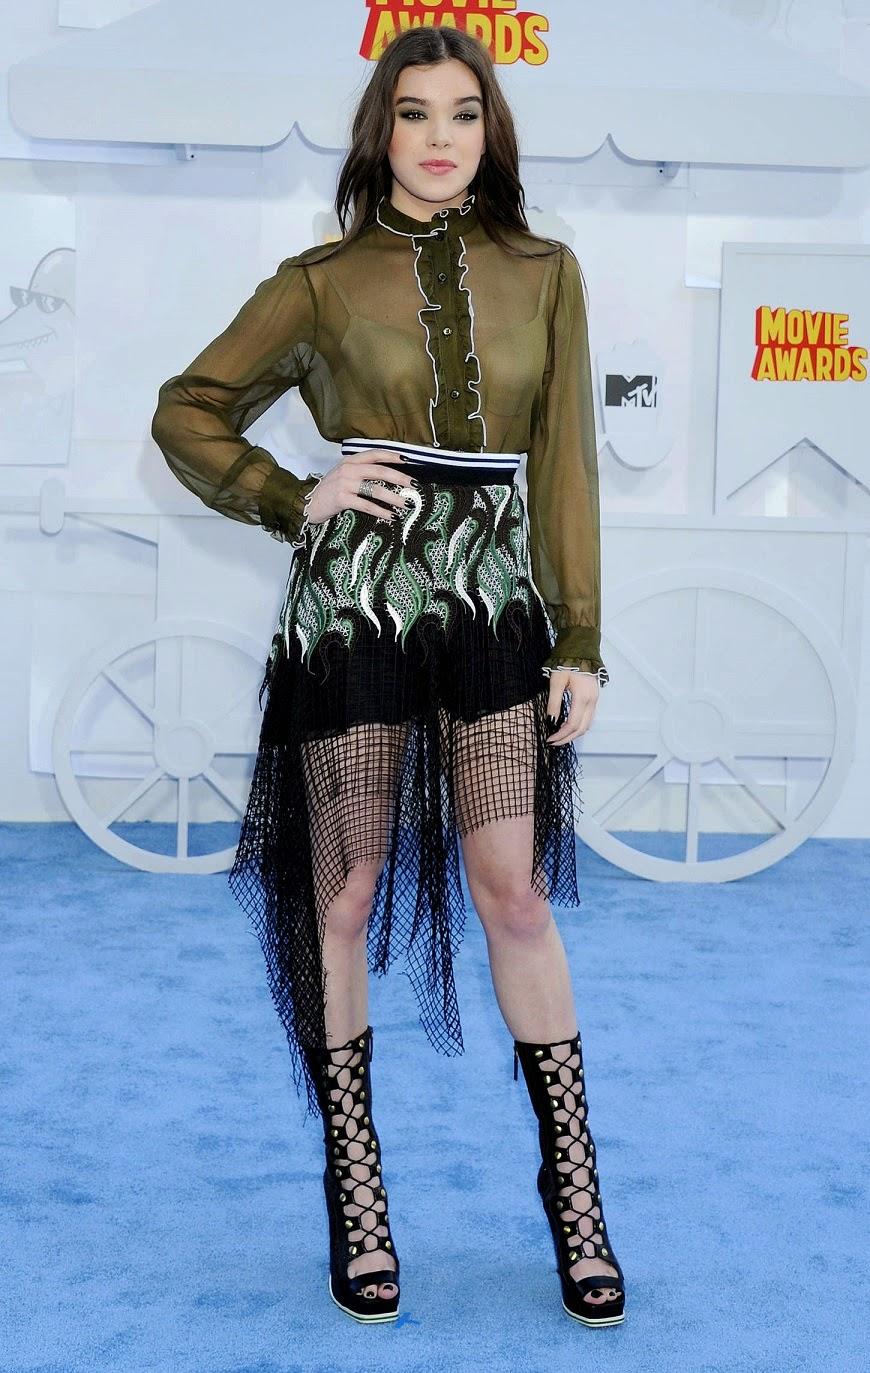 Hailee Steinfeld wears a trendy Rodarte ensemble to the 2015 MTV Movie Awards